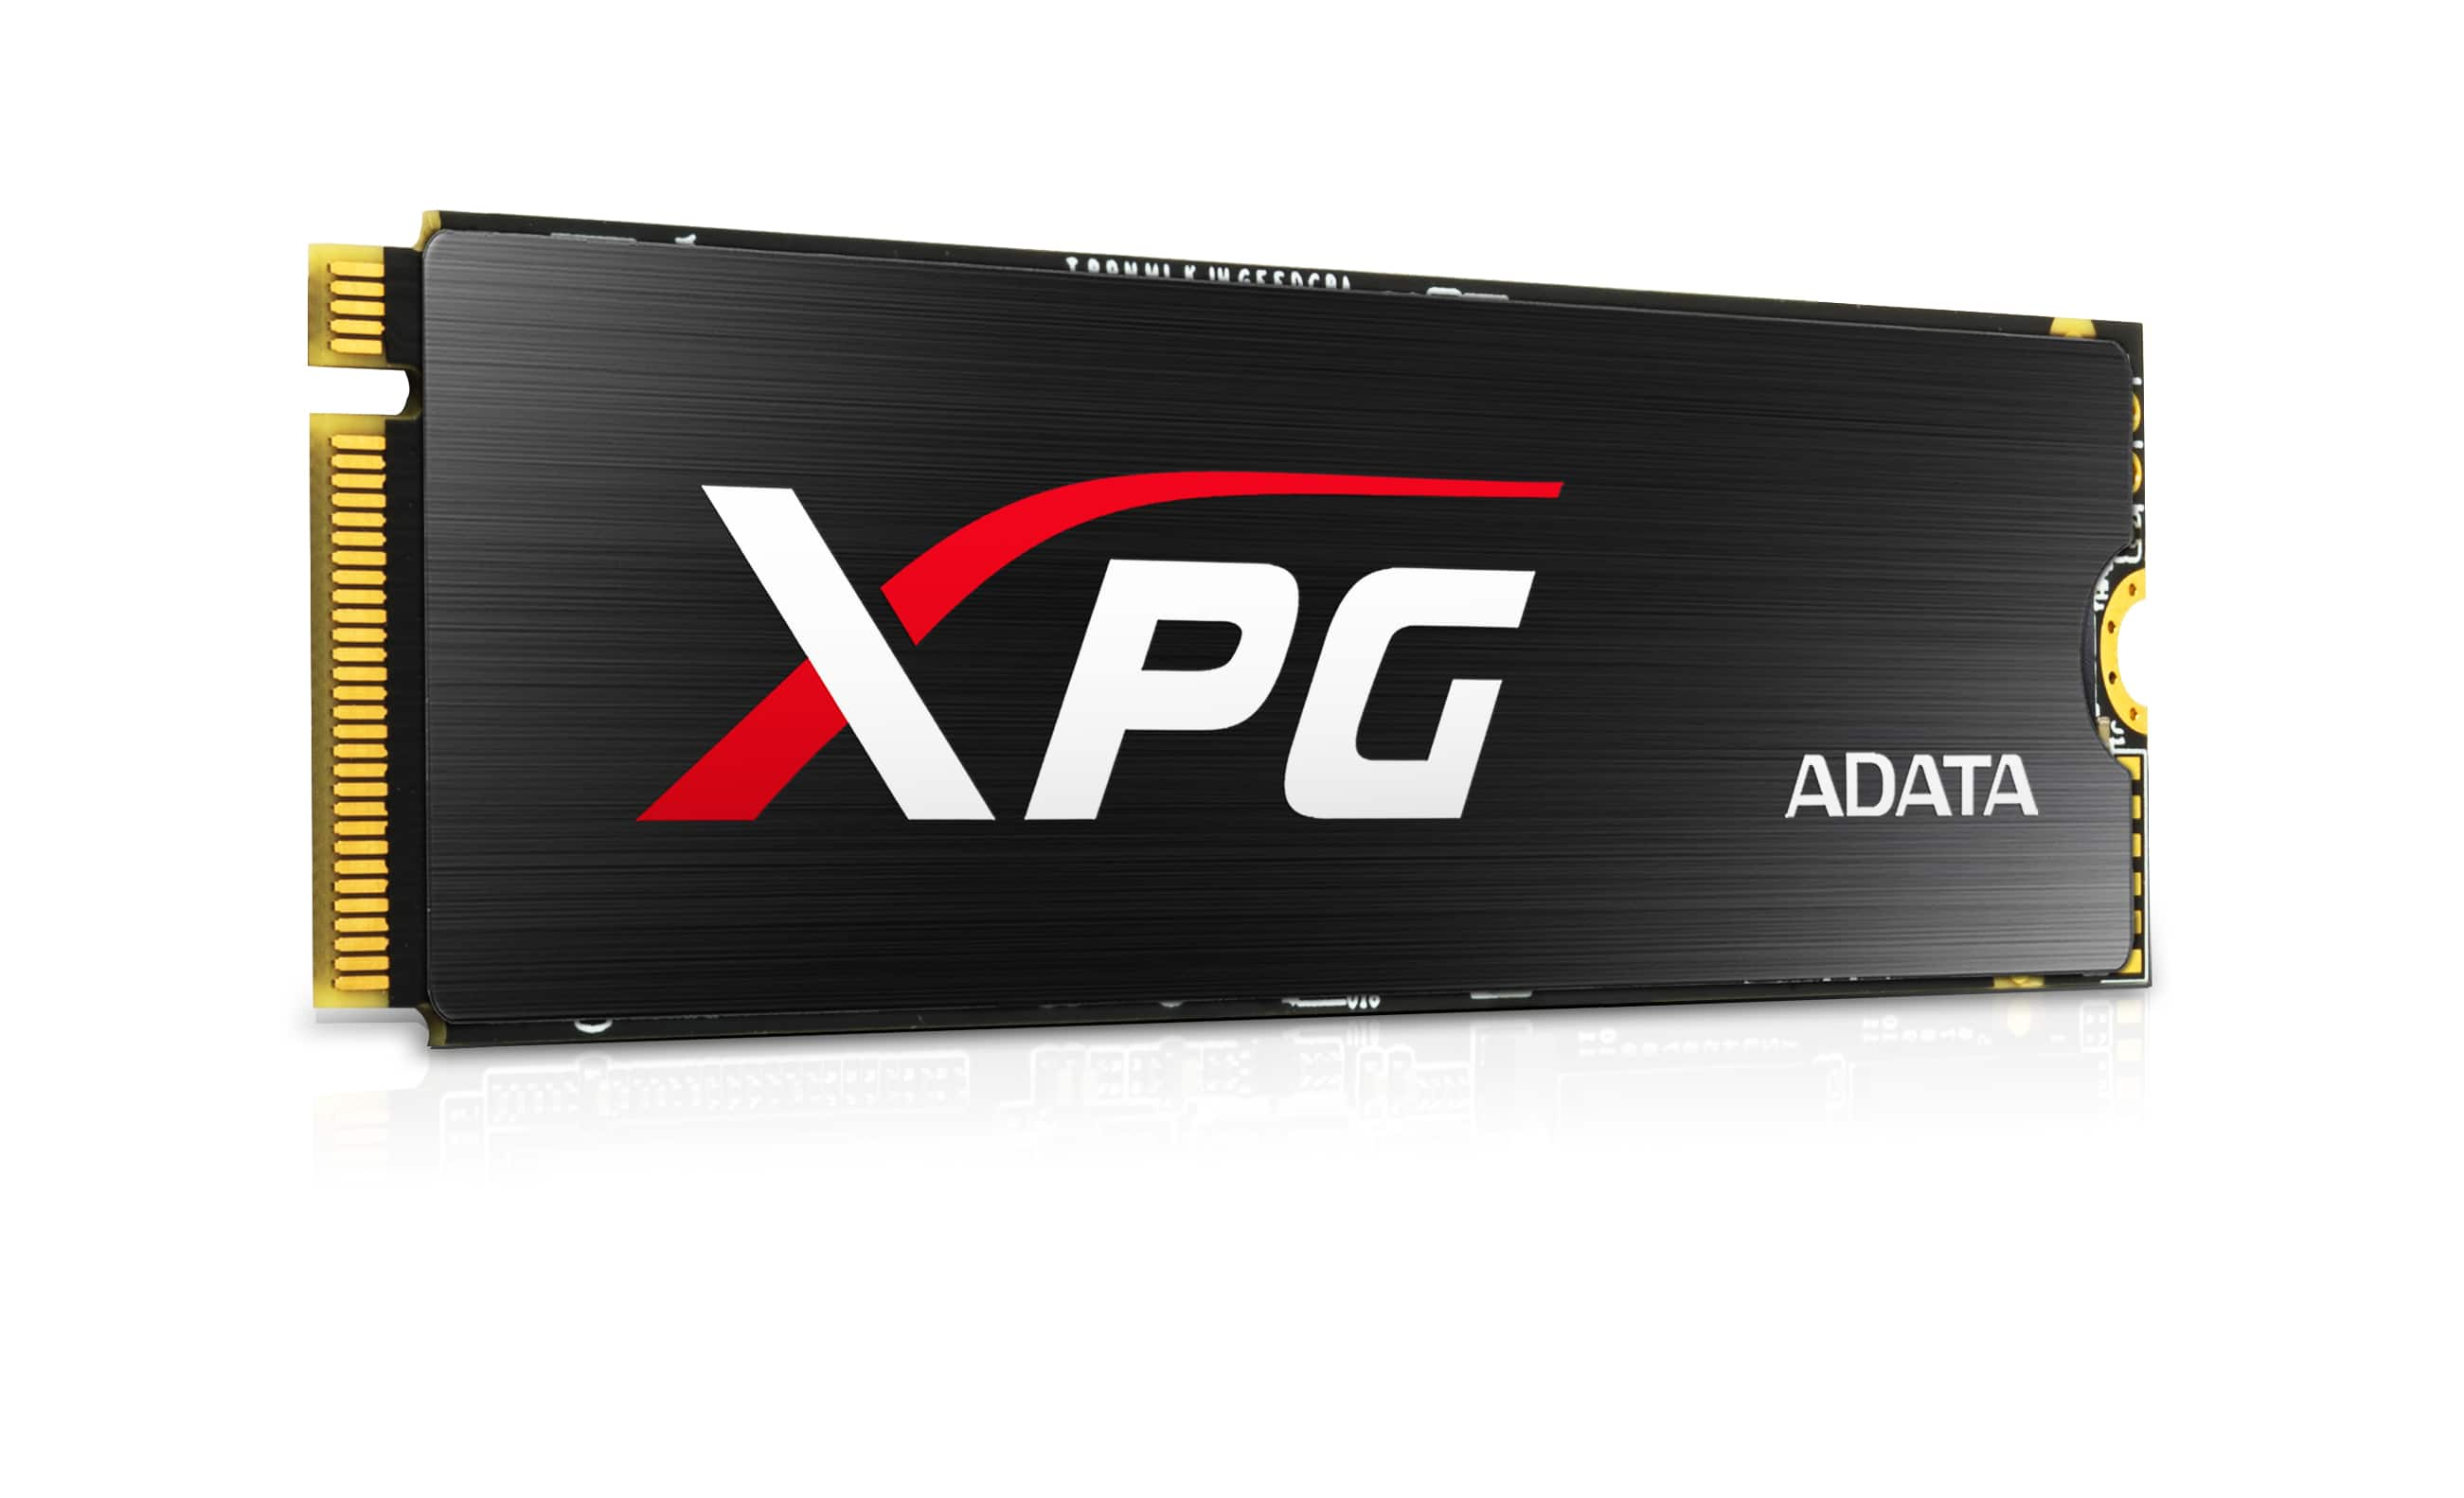 XPG SX8200 PCIE NVME GEN3X4 M.2 2280 480GB SSD W/ BLACK XPG HEATSINK BACK IN STOCK 99.45 after coupon AD17 $99.45